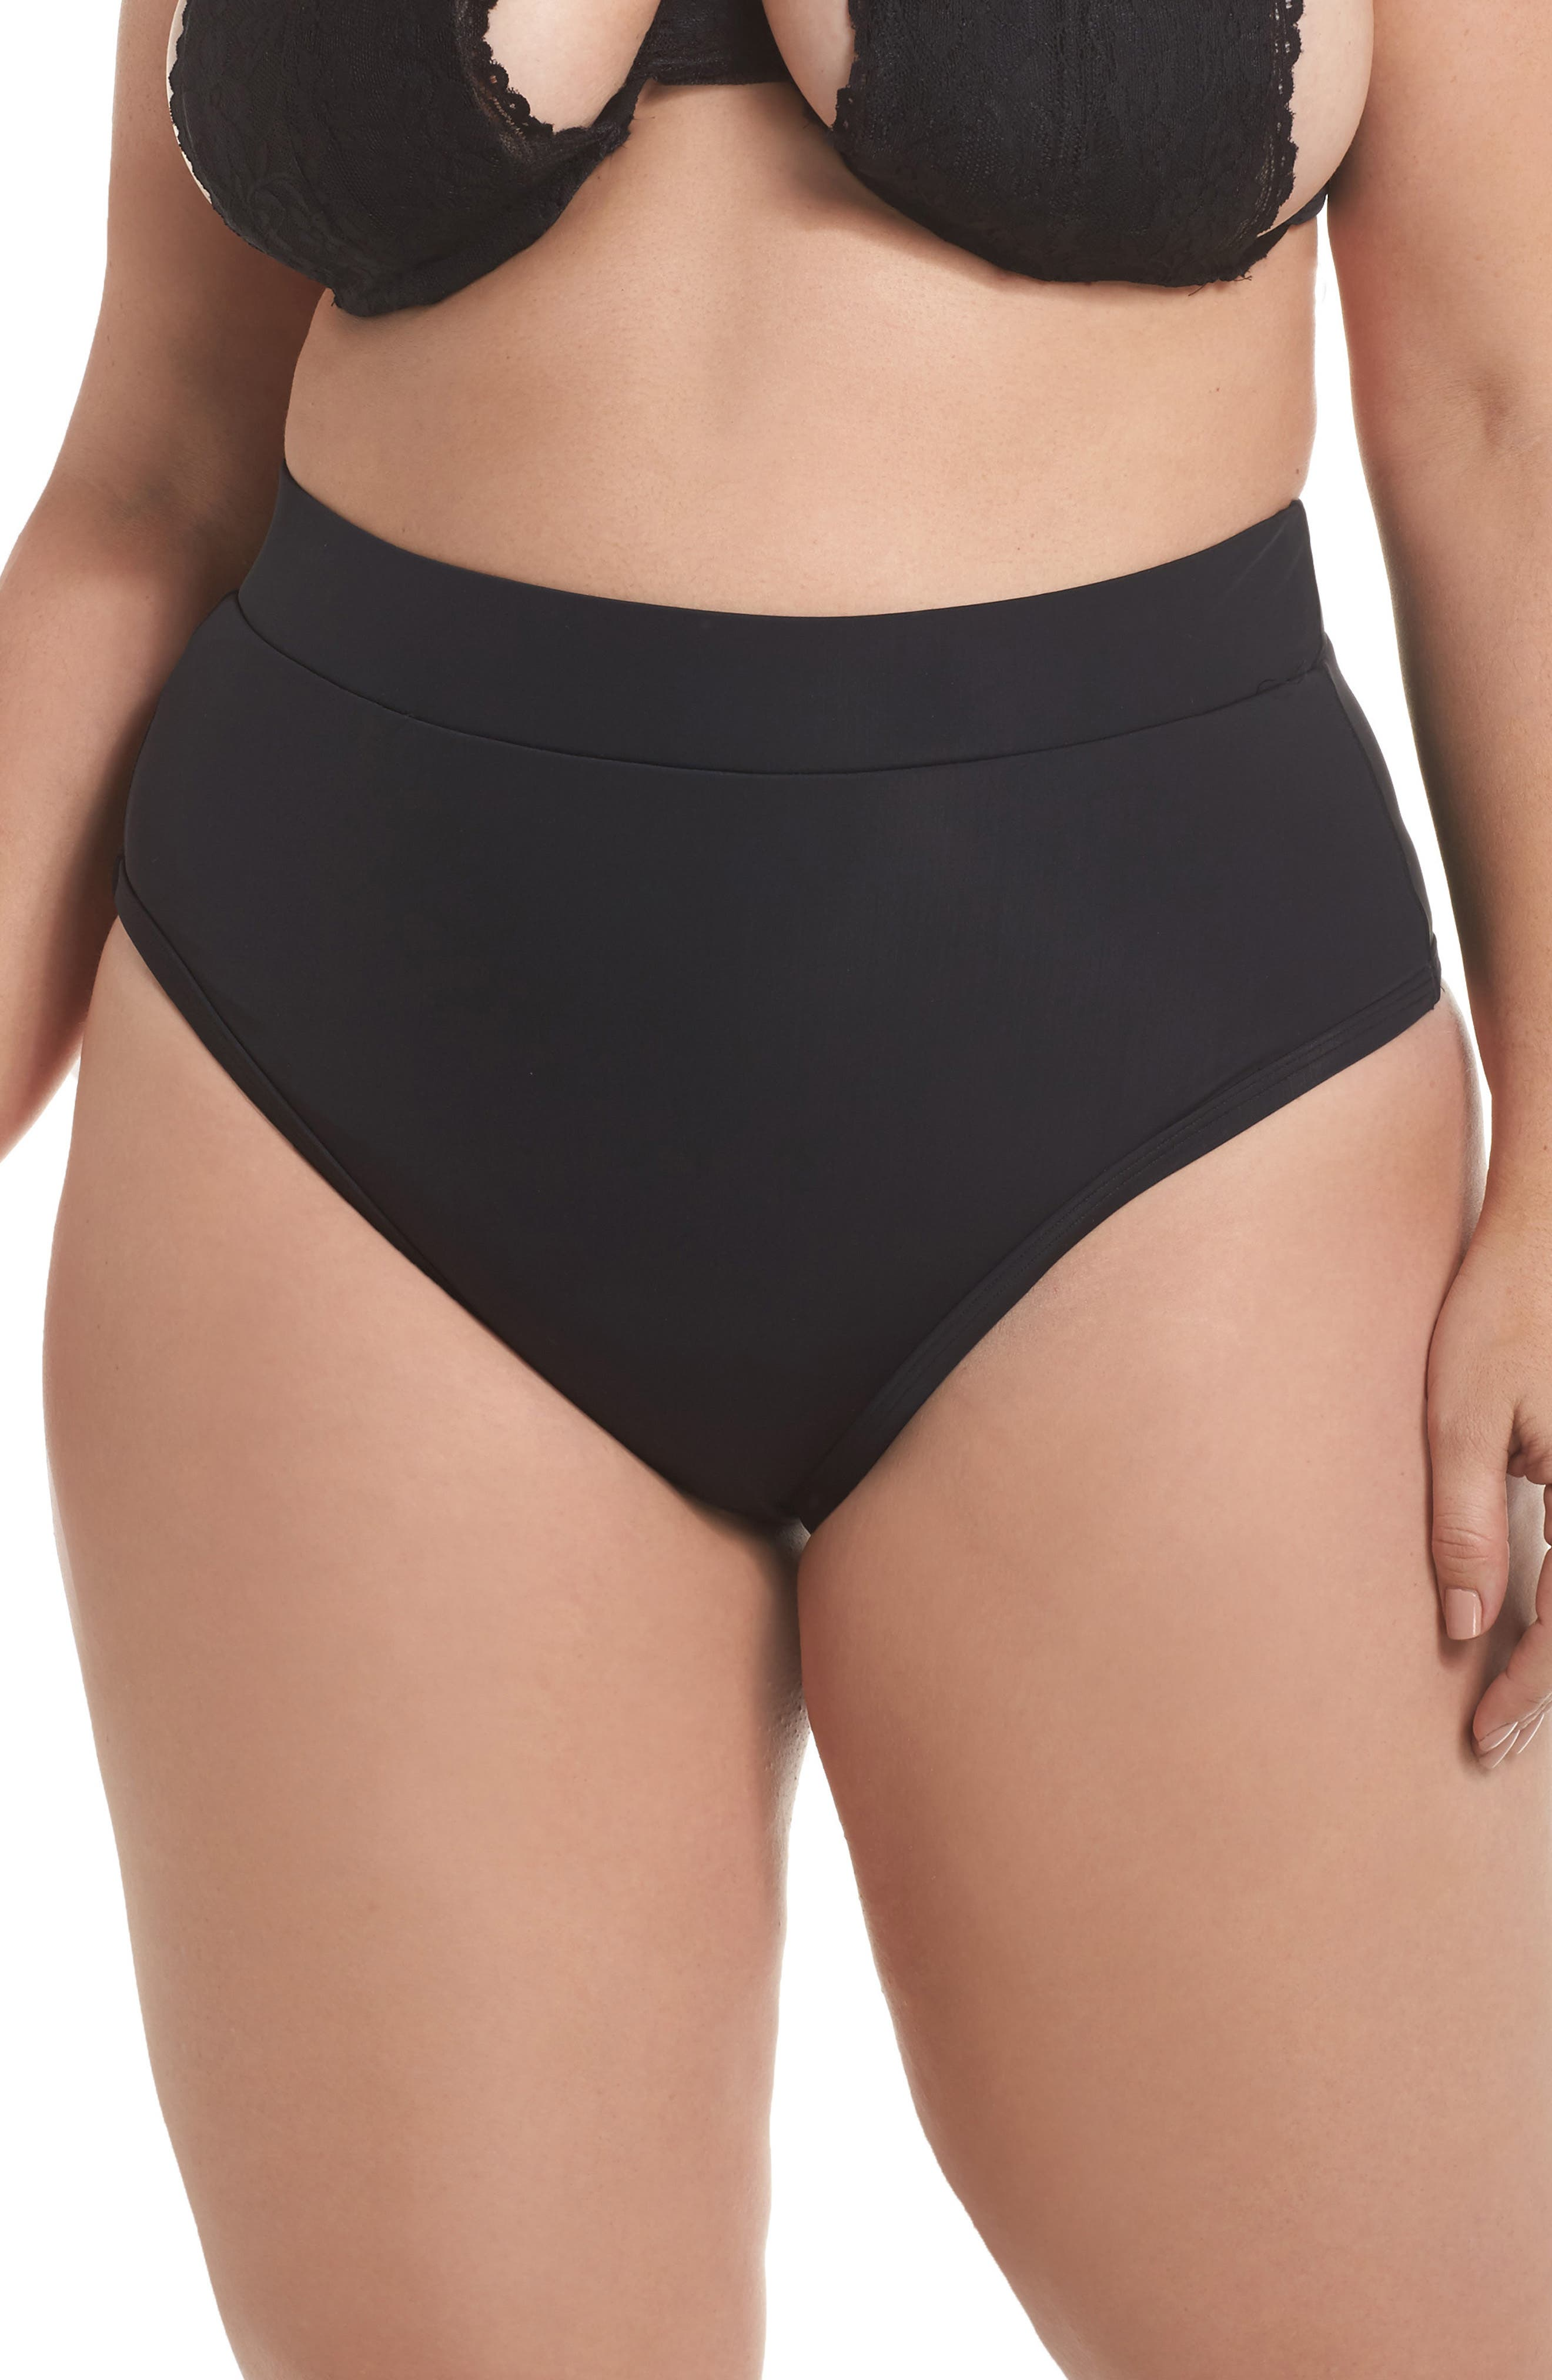 ALPINE BUTTERFLY Lover High Waist Bikini Bottoms, Main, color, BLACK